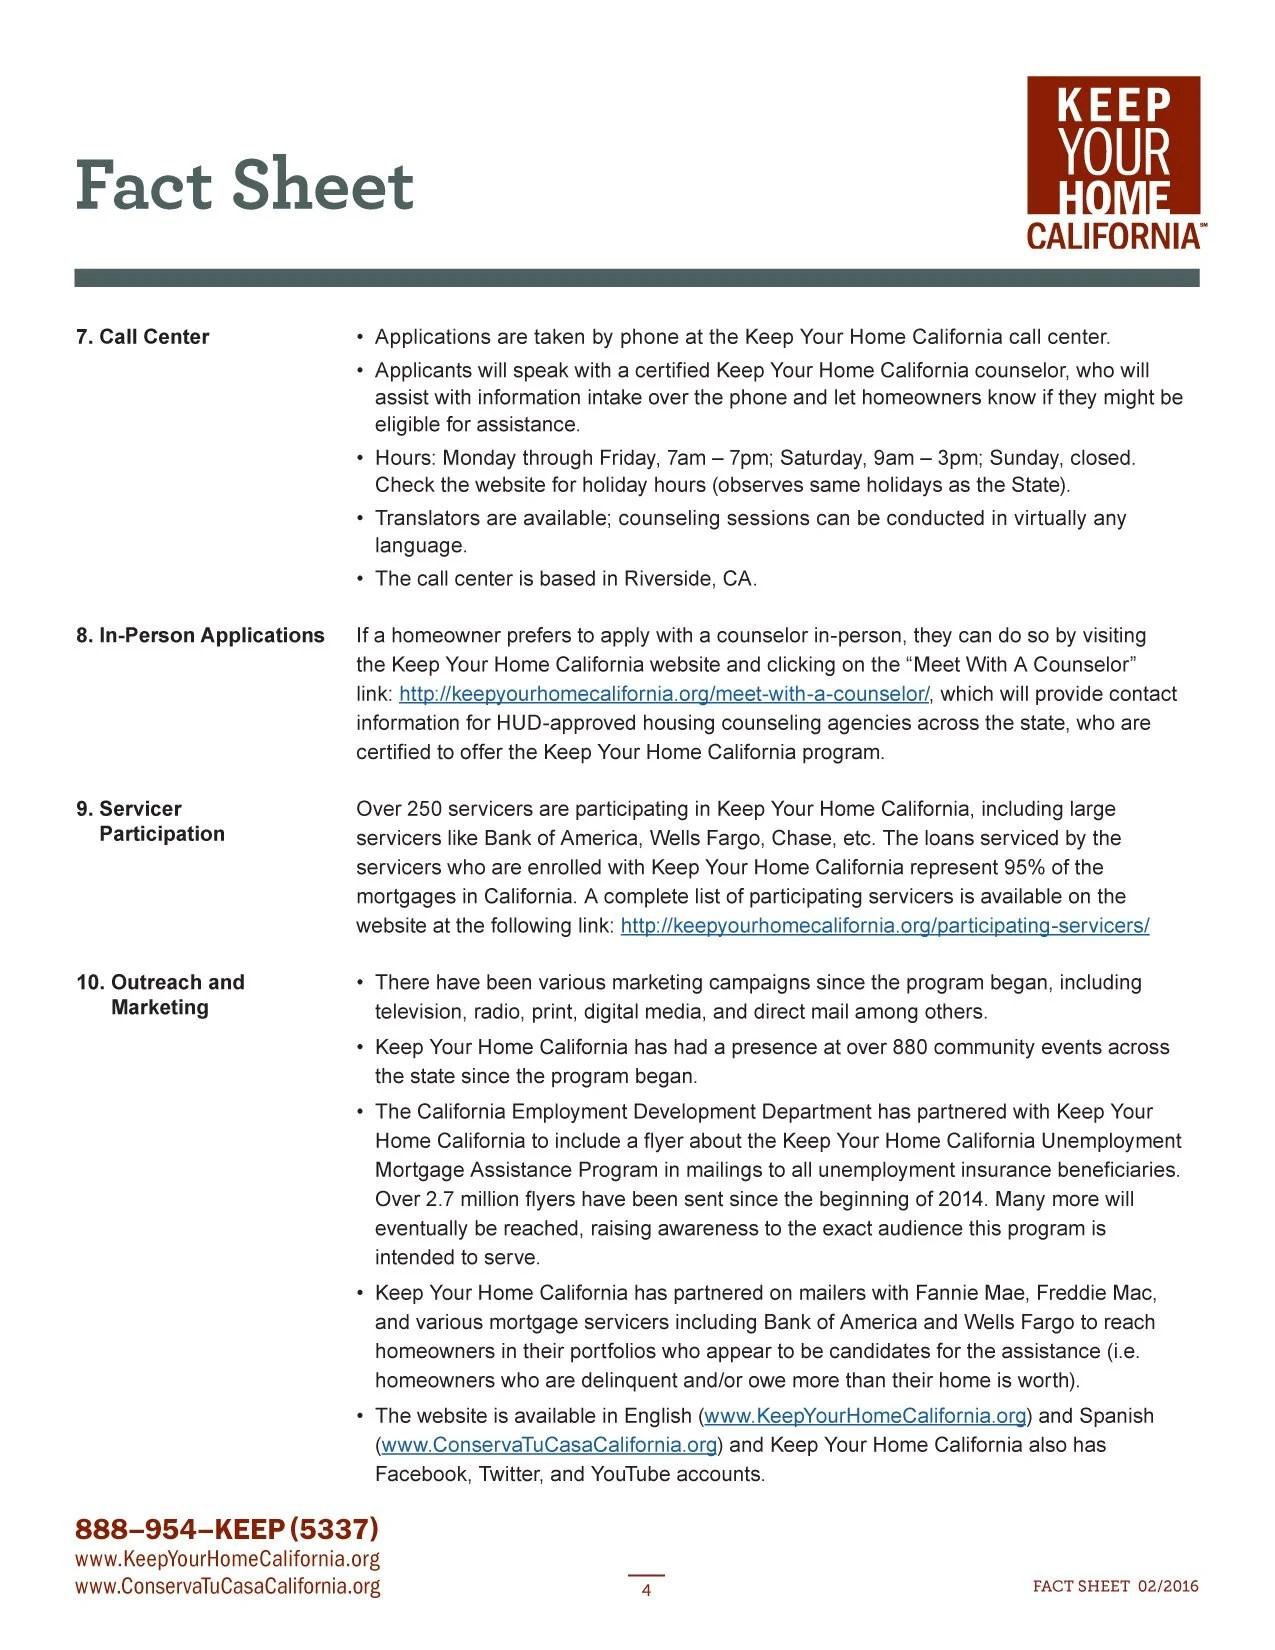 Fact-Sheet-4